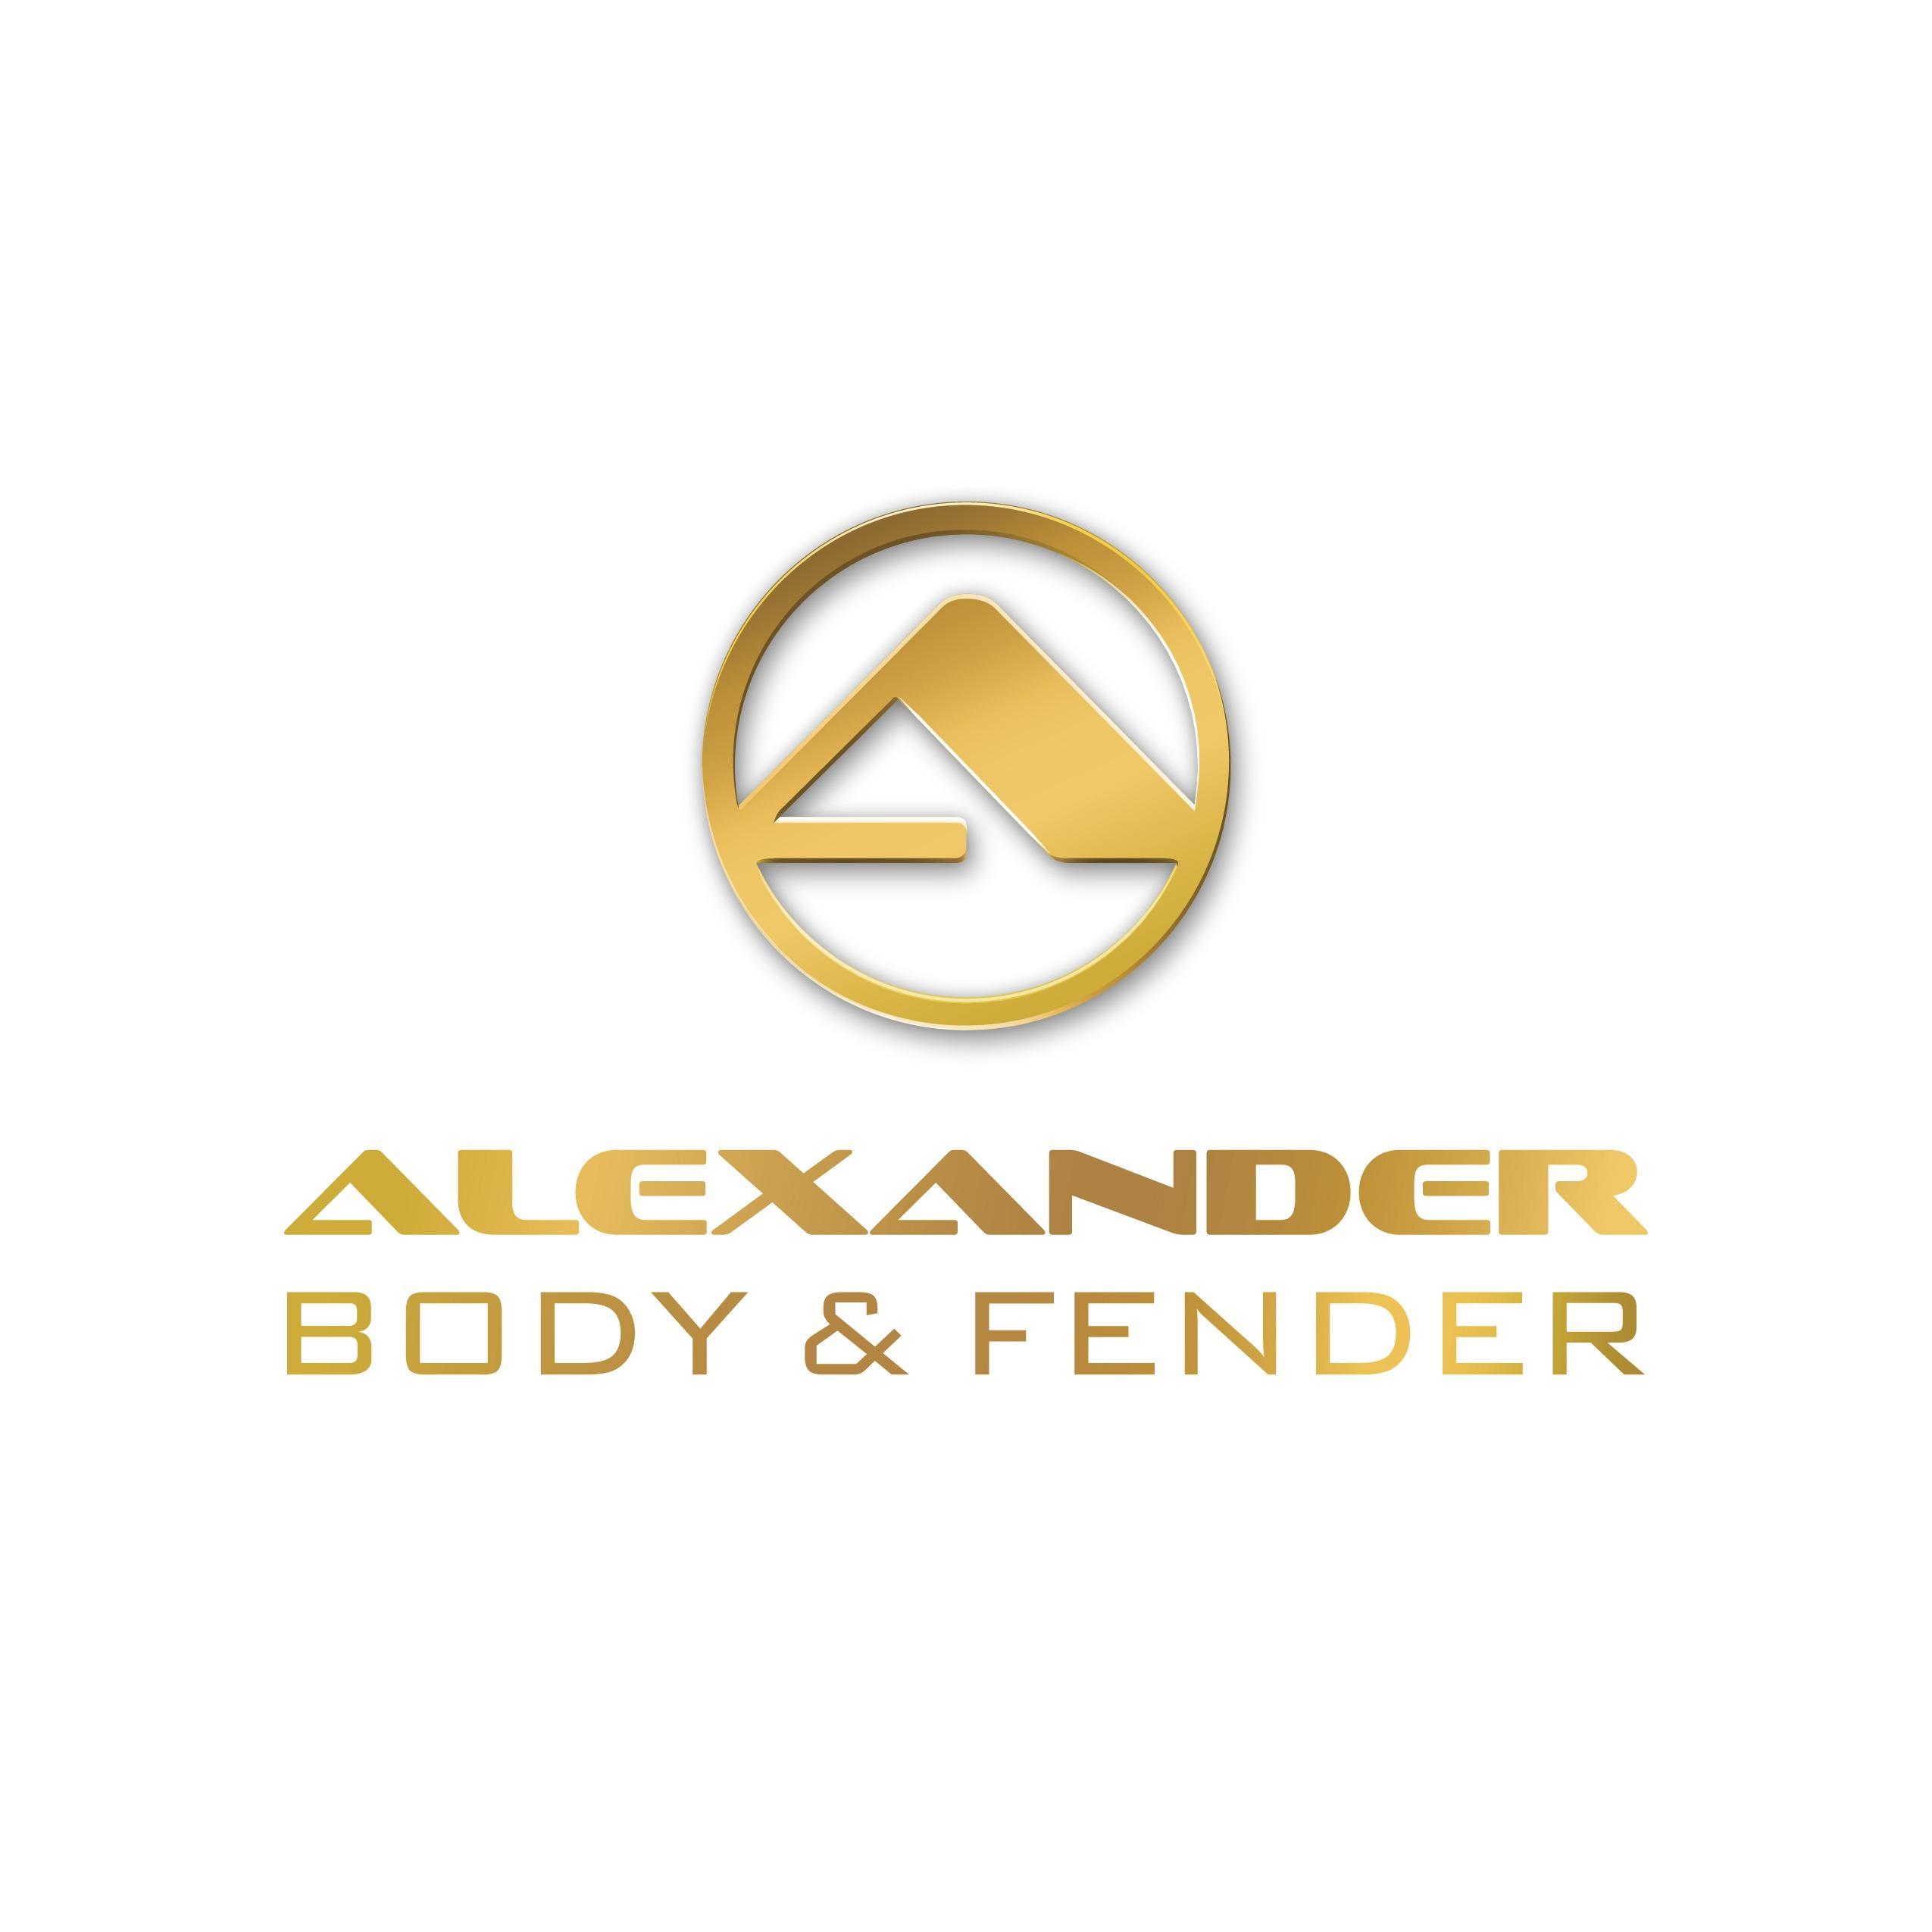 Alexander Body & Fender